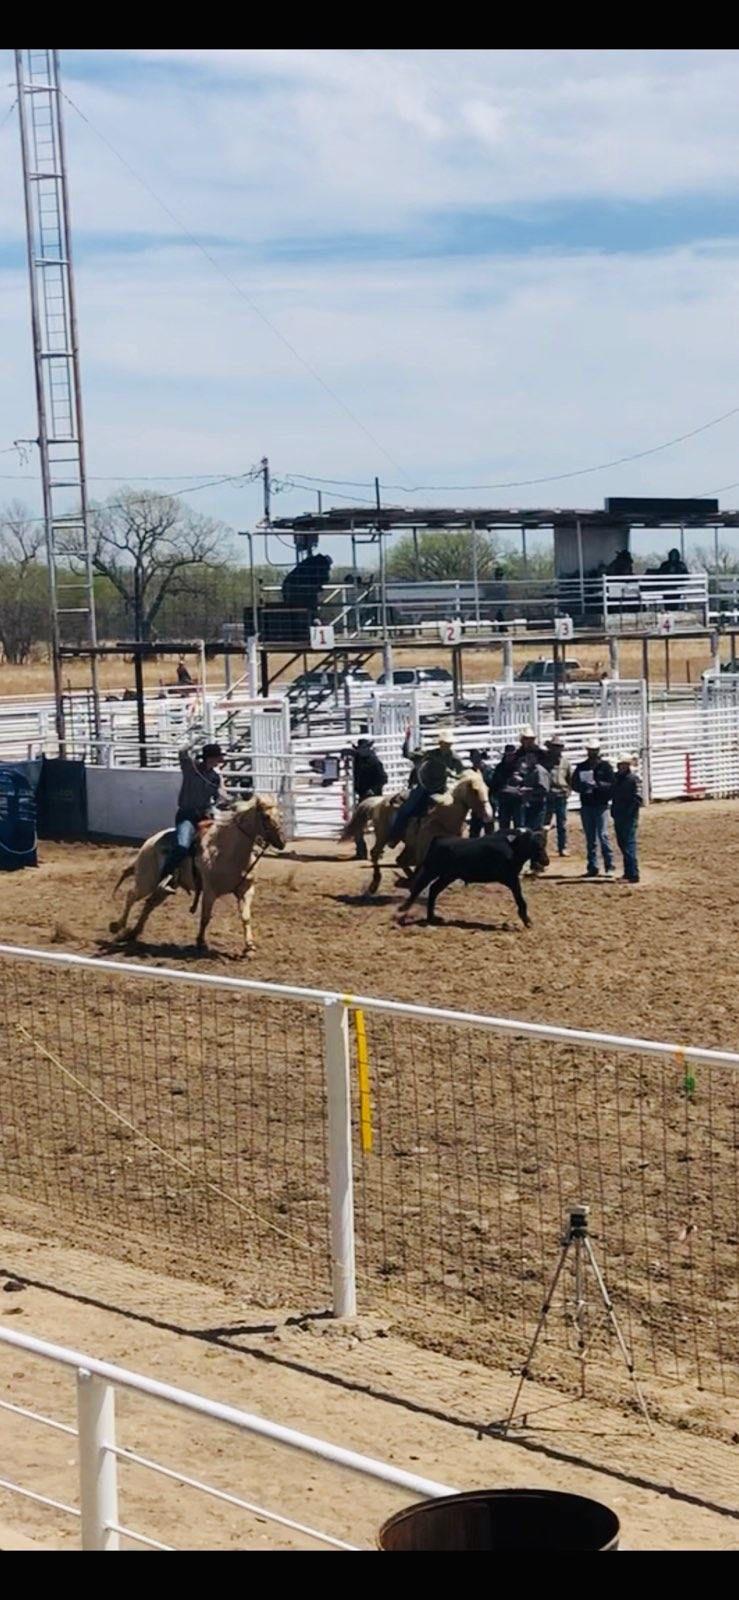 060819-gaz-rodeo2